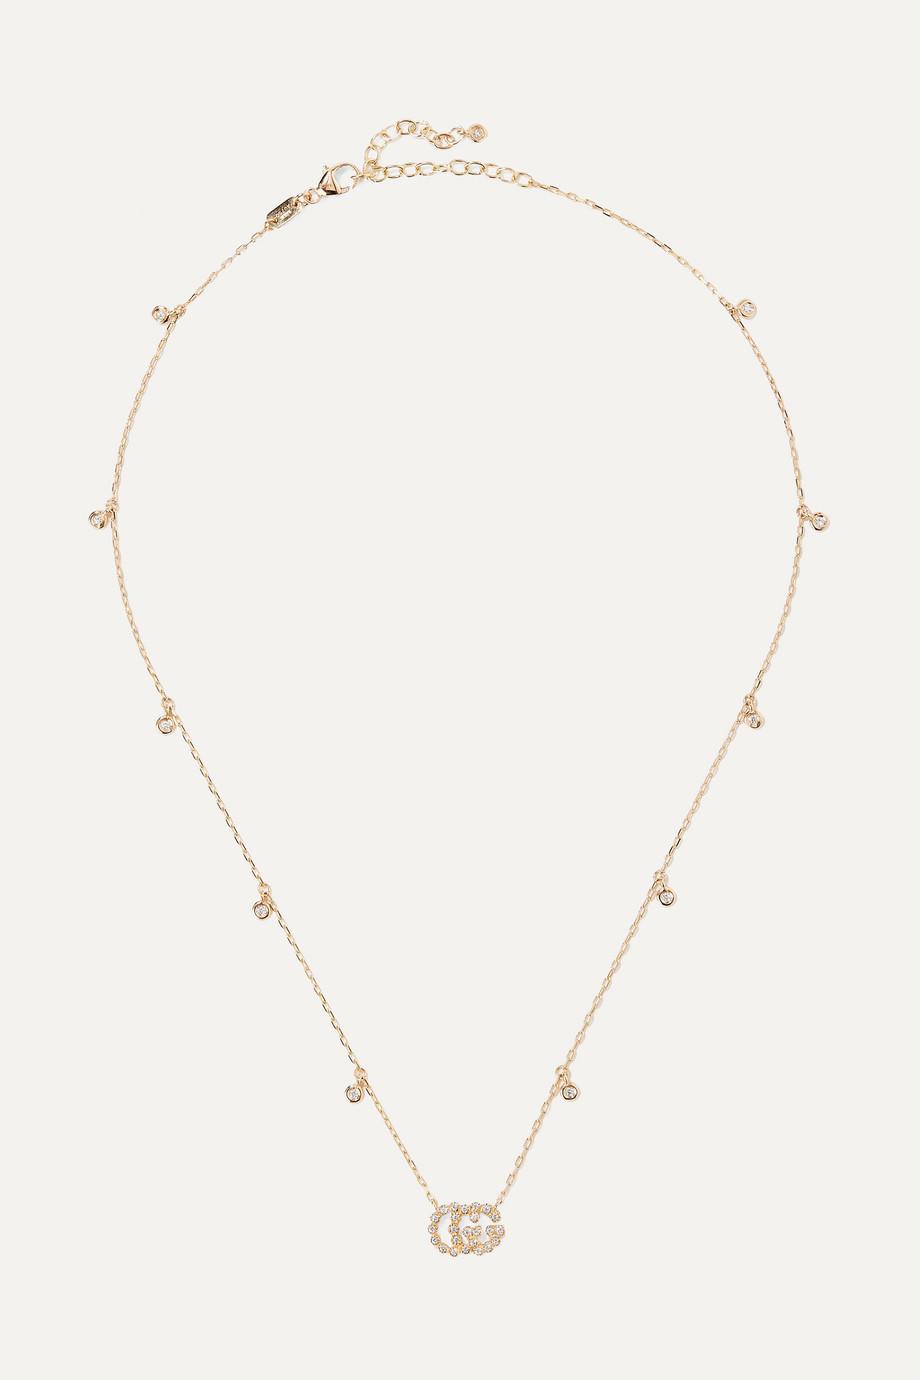 Gucci 18-karat gold diamond necklace